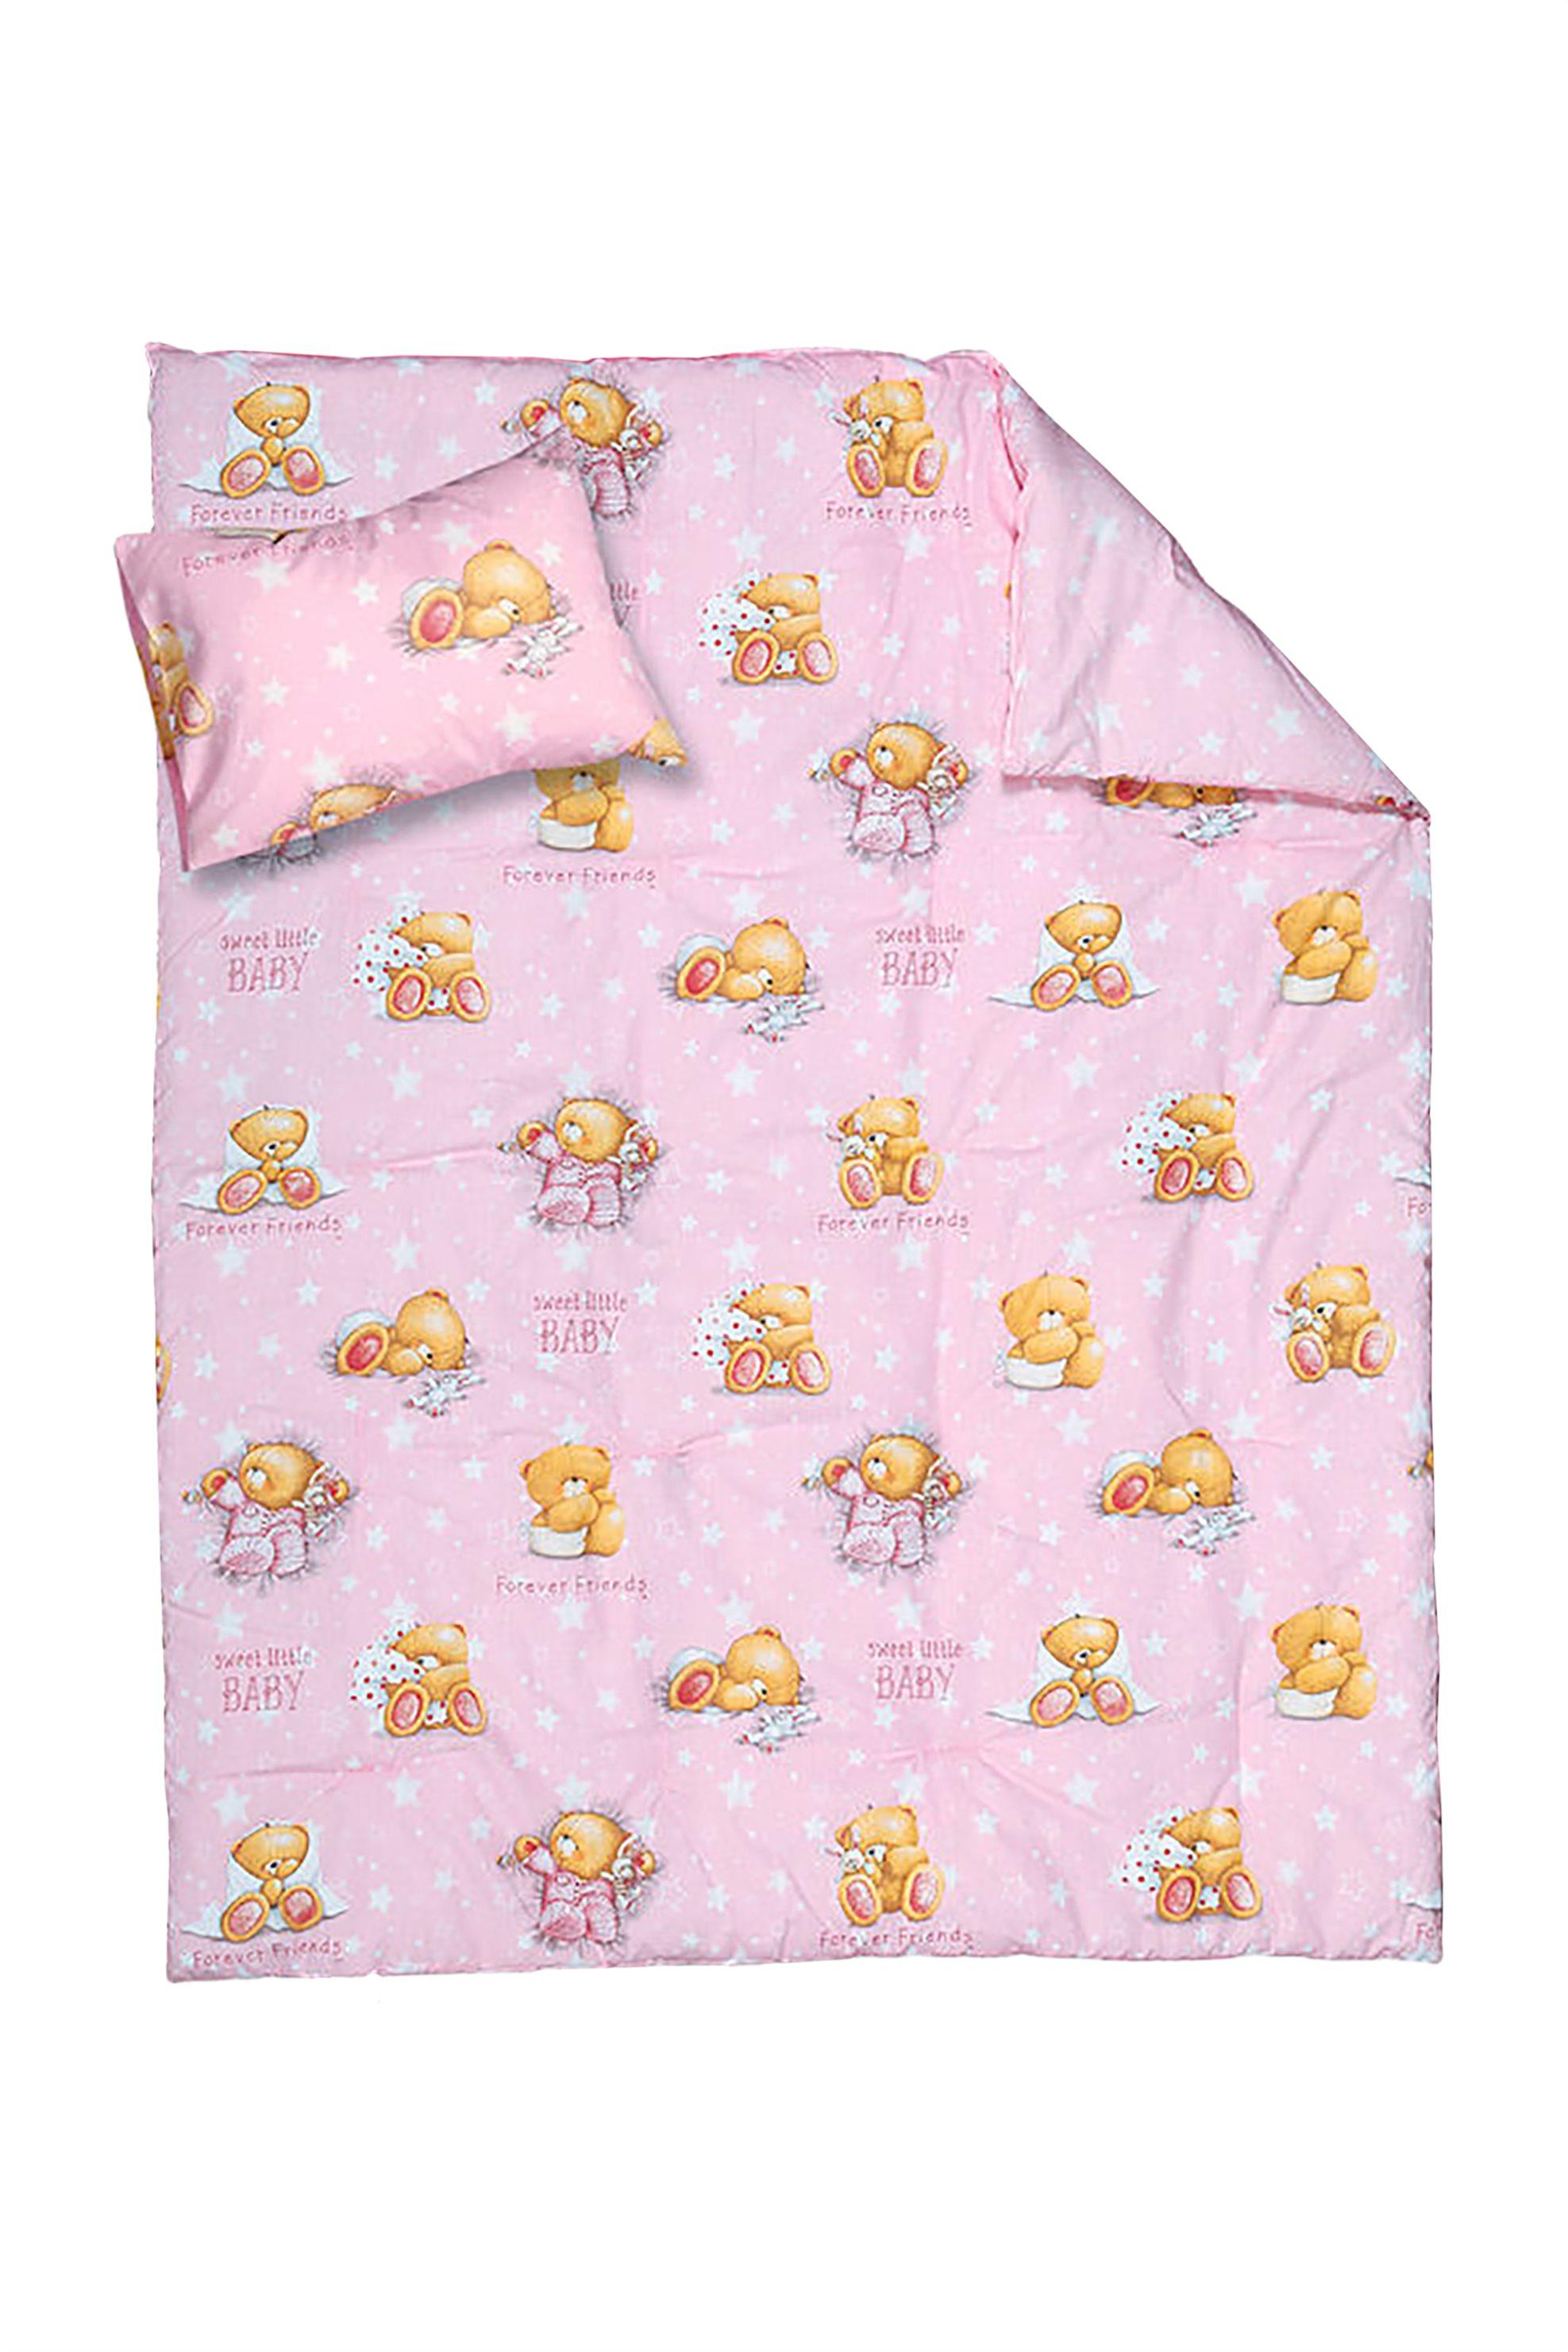 NEF-NEF Σετ βρεφική παπλωματοθήκη Forever Sleepy (2 τεμάχια)  - 019791 - Ροζ home   παιδια   παπλωματοθήκες   σετ παιδικές παπλωματοθήκες